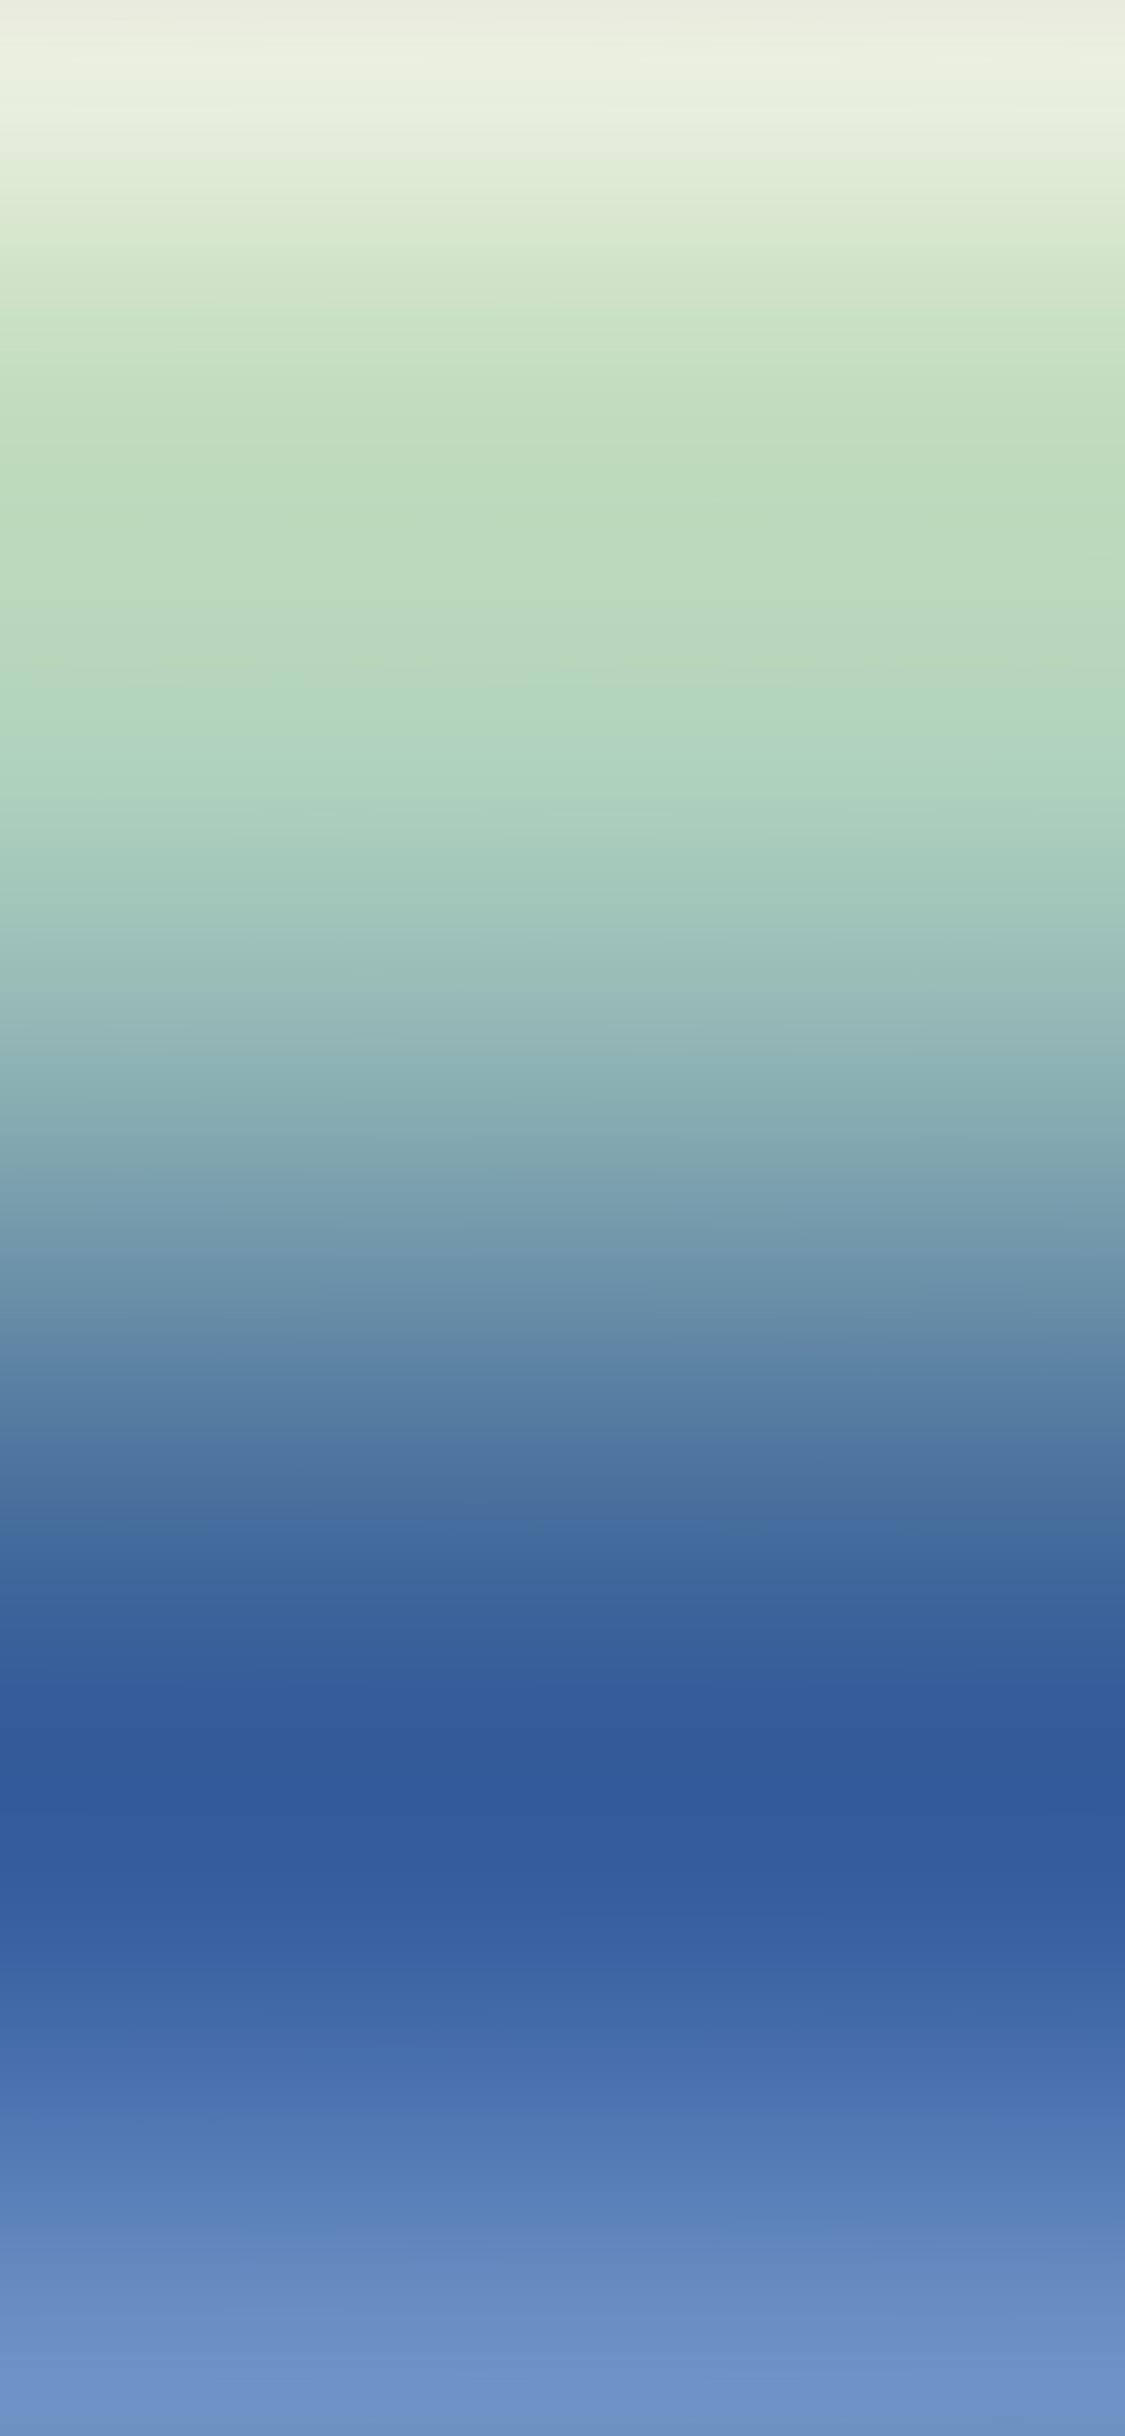 iPhoneXpapers.com-Apple-iPhone-wallpaper-sl51-blue-sky-blur-gradation